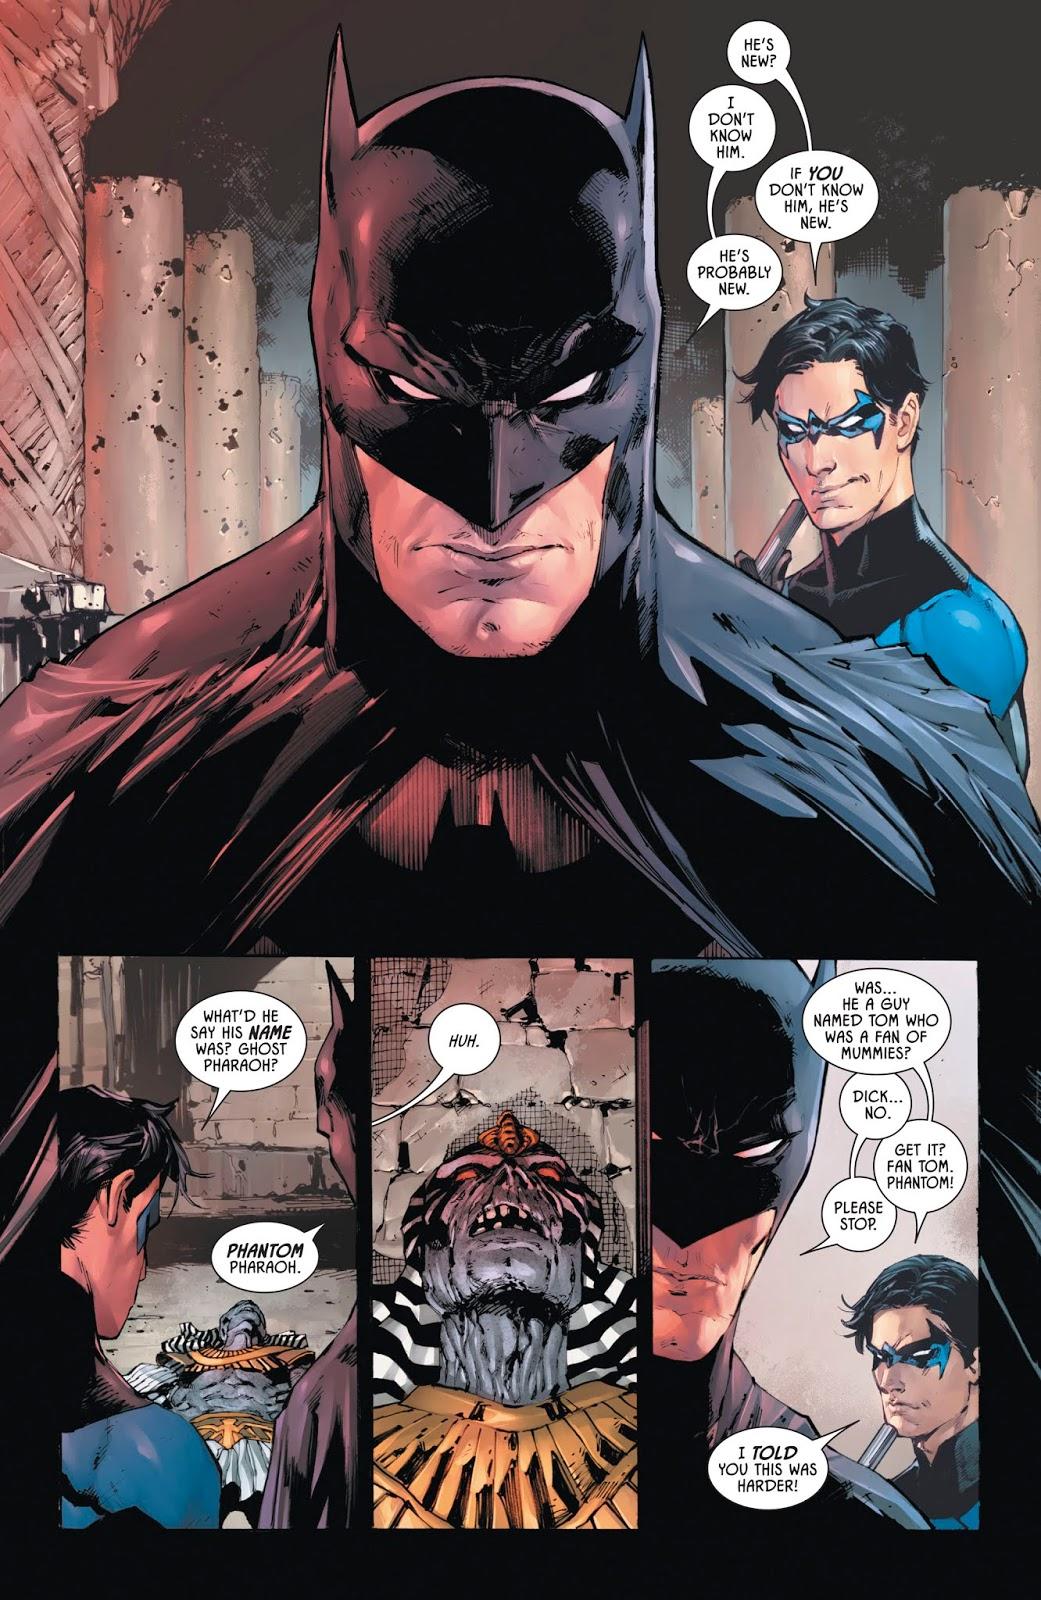 Batman And Nightwing VS Mummies